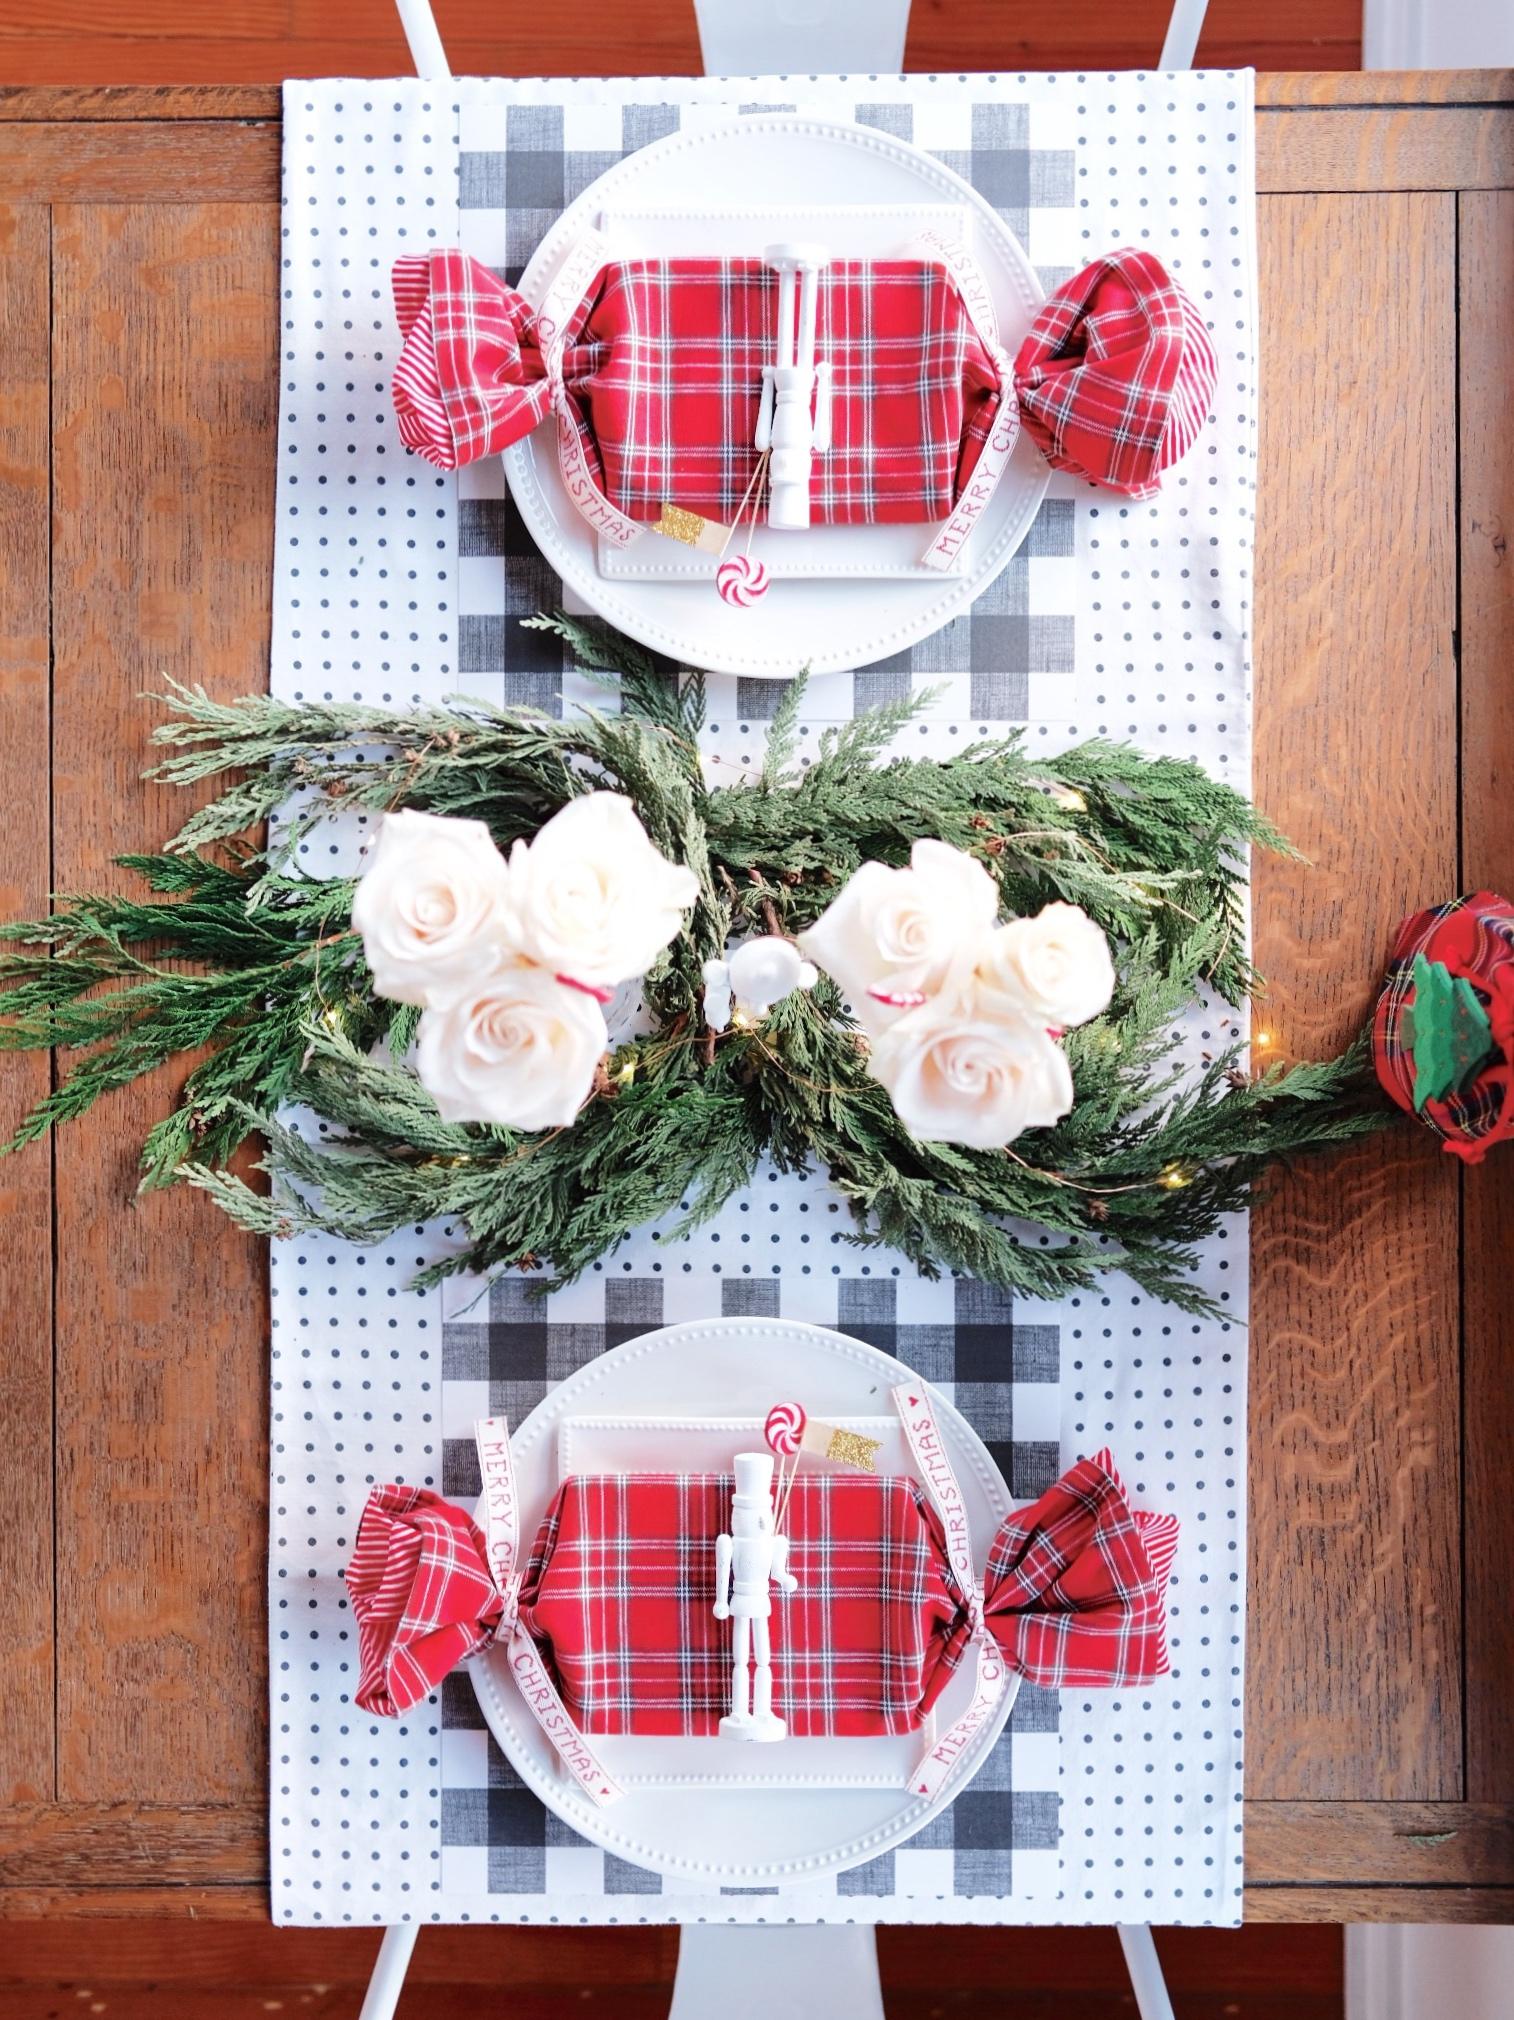 Budget friendly Christmas Tablescape, DIY Nutcracker Place Cards, Romantic Papyrus Christmas Card, Plaid Tablescape for Christmas, DIY Table Runner.